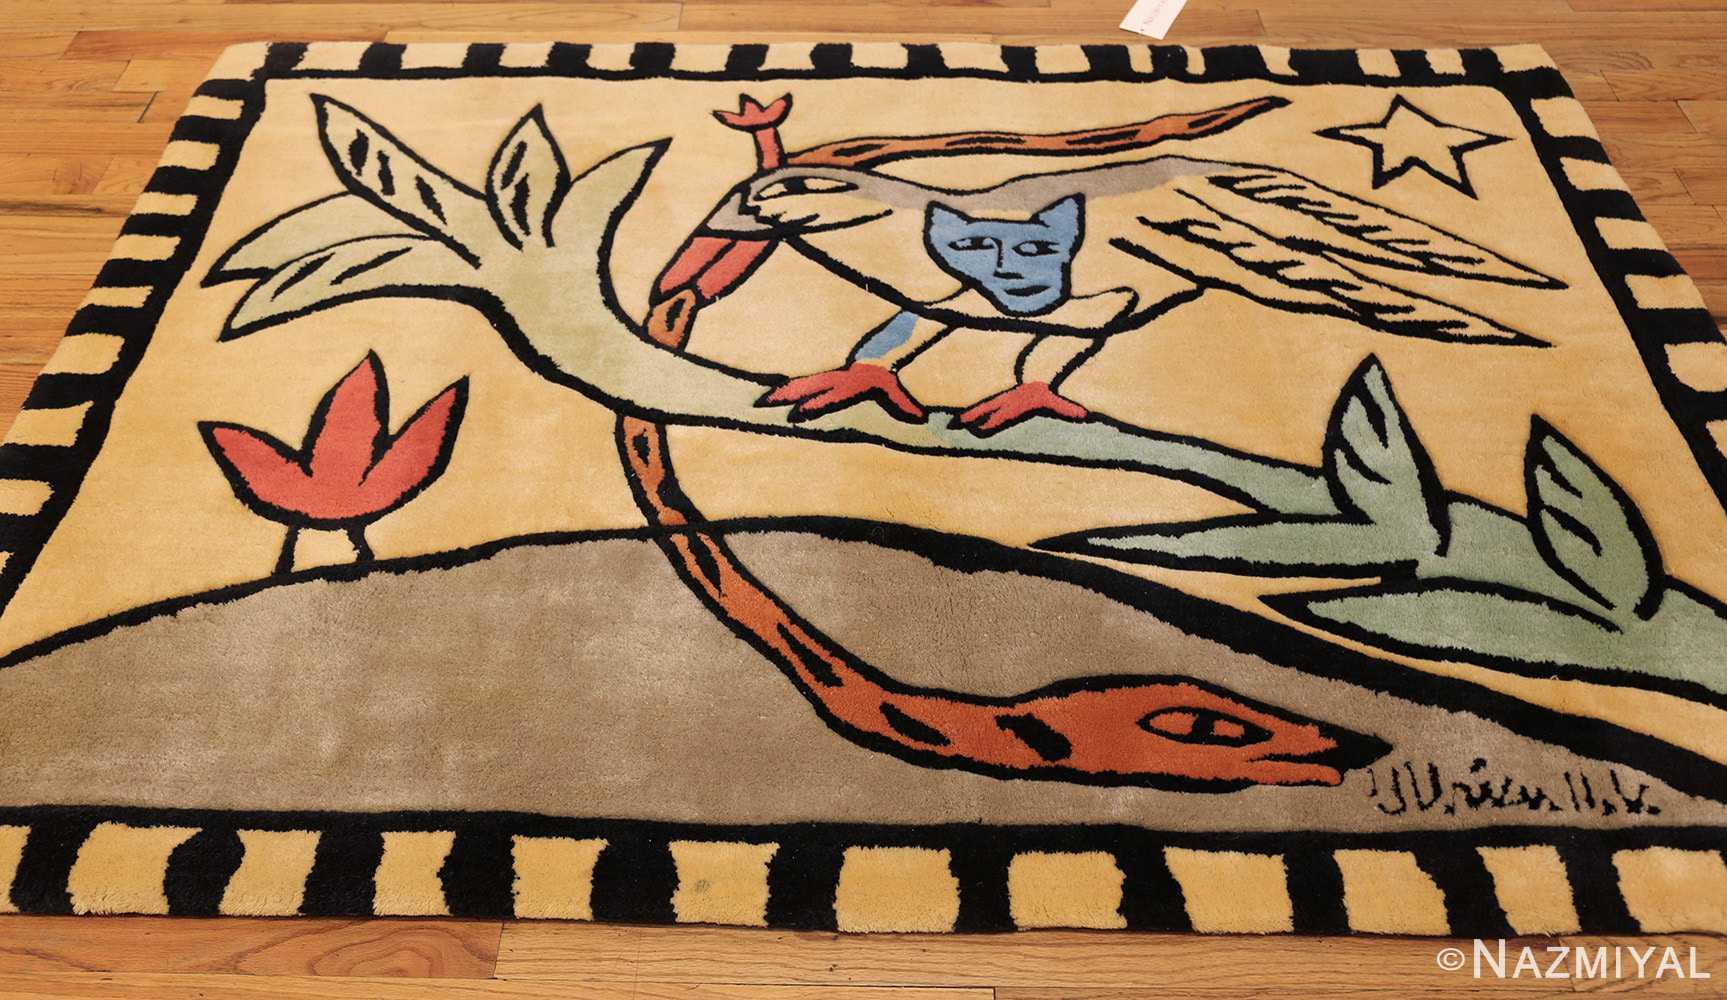 scandinavian rug after ulrica hydman vallien 48281 whole Nazmiyal